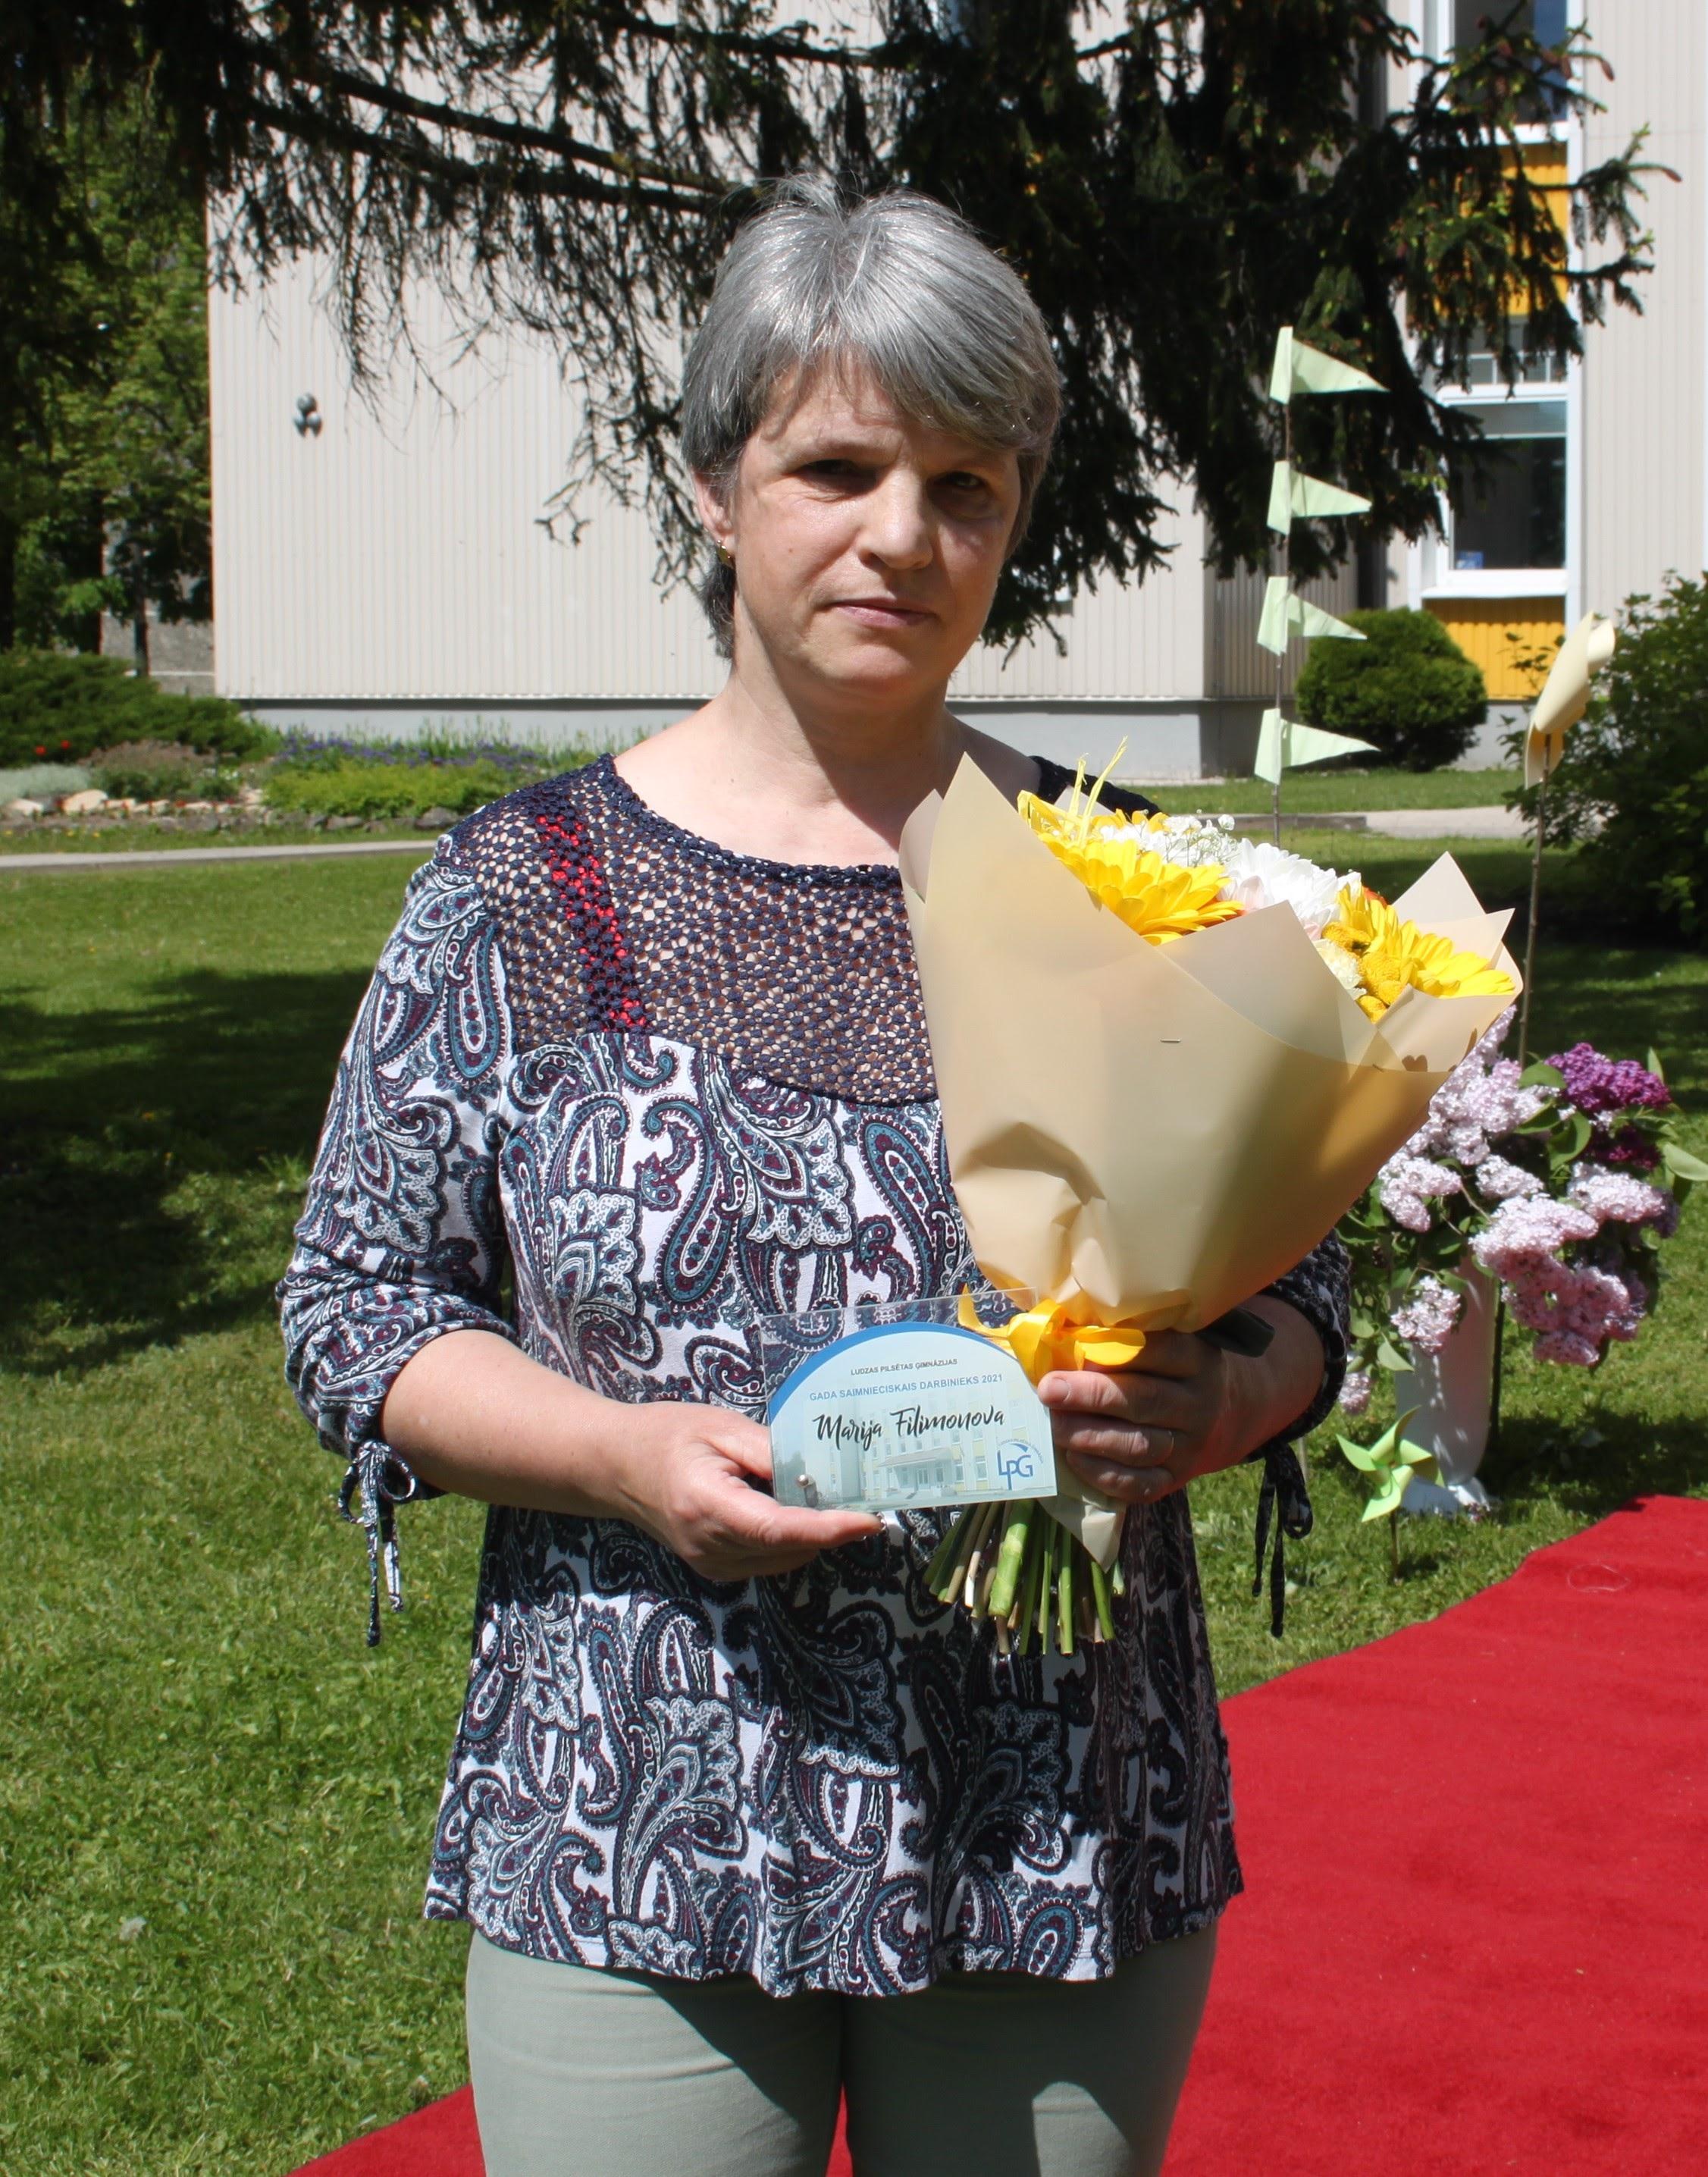 Marija Filimonova